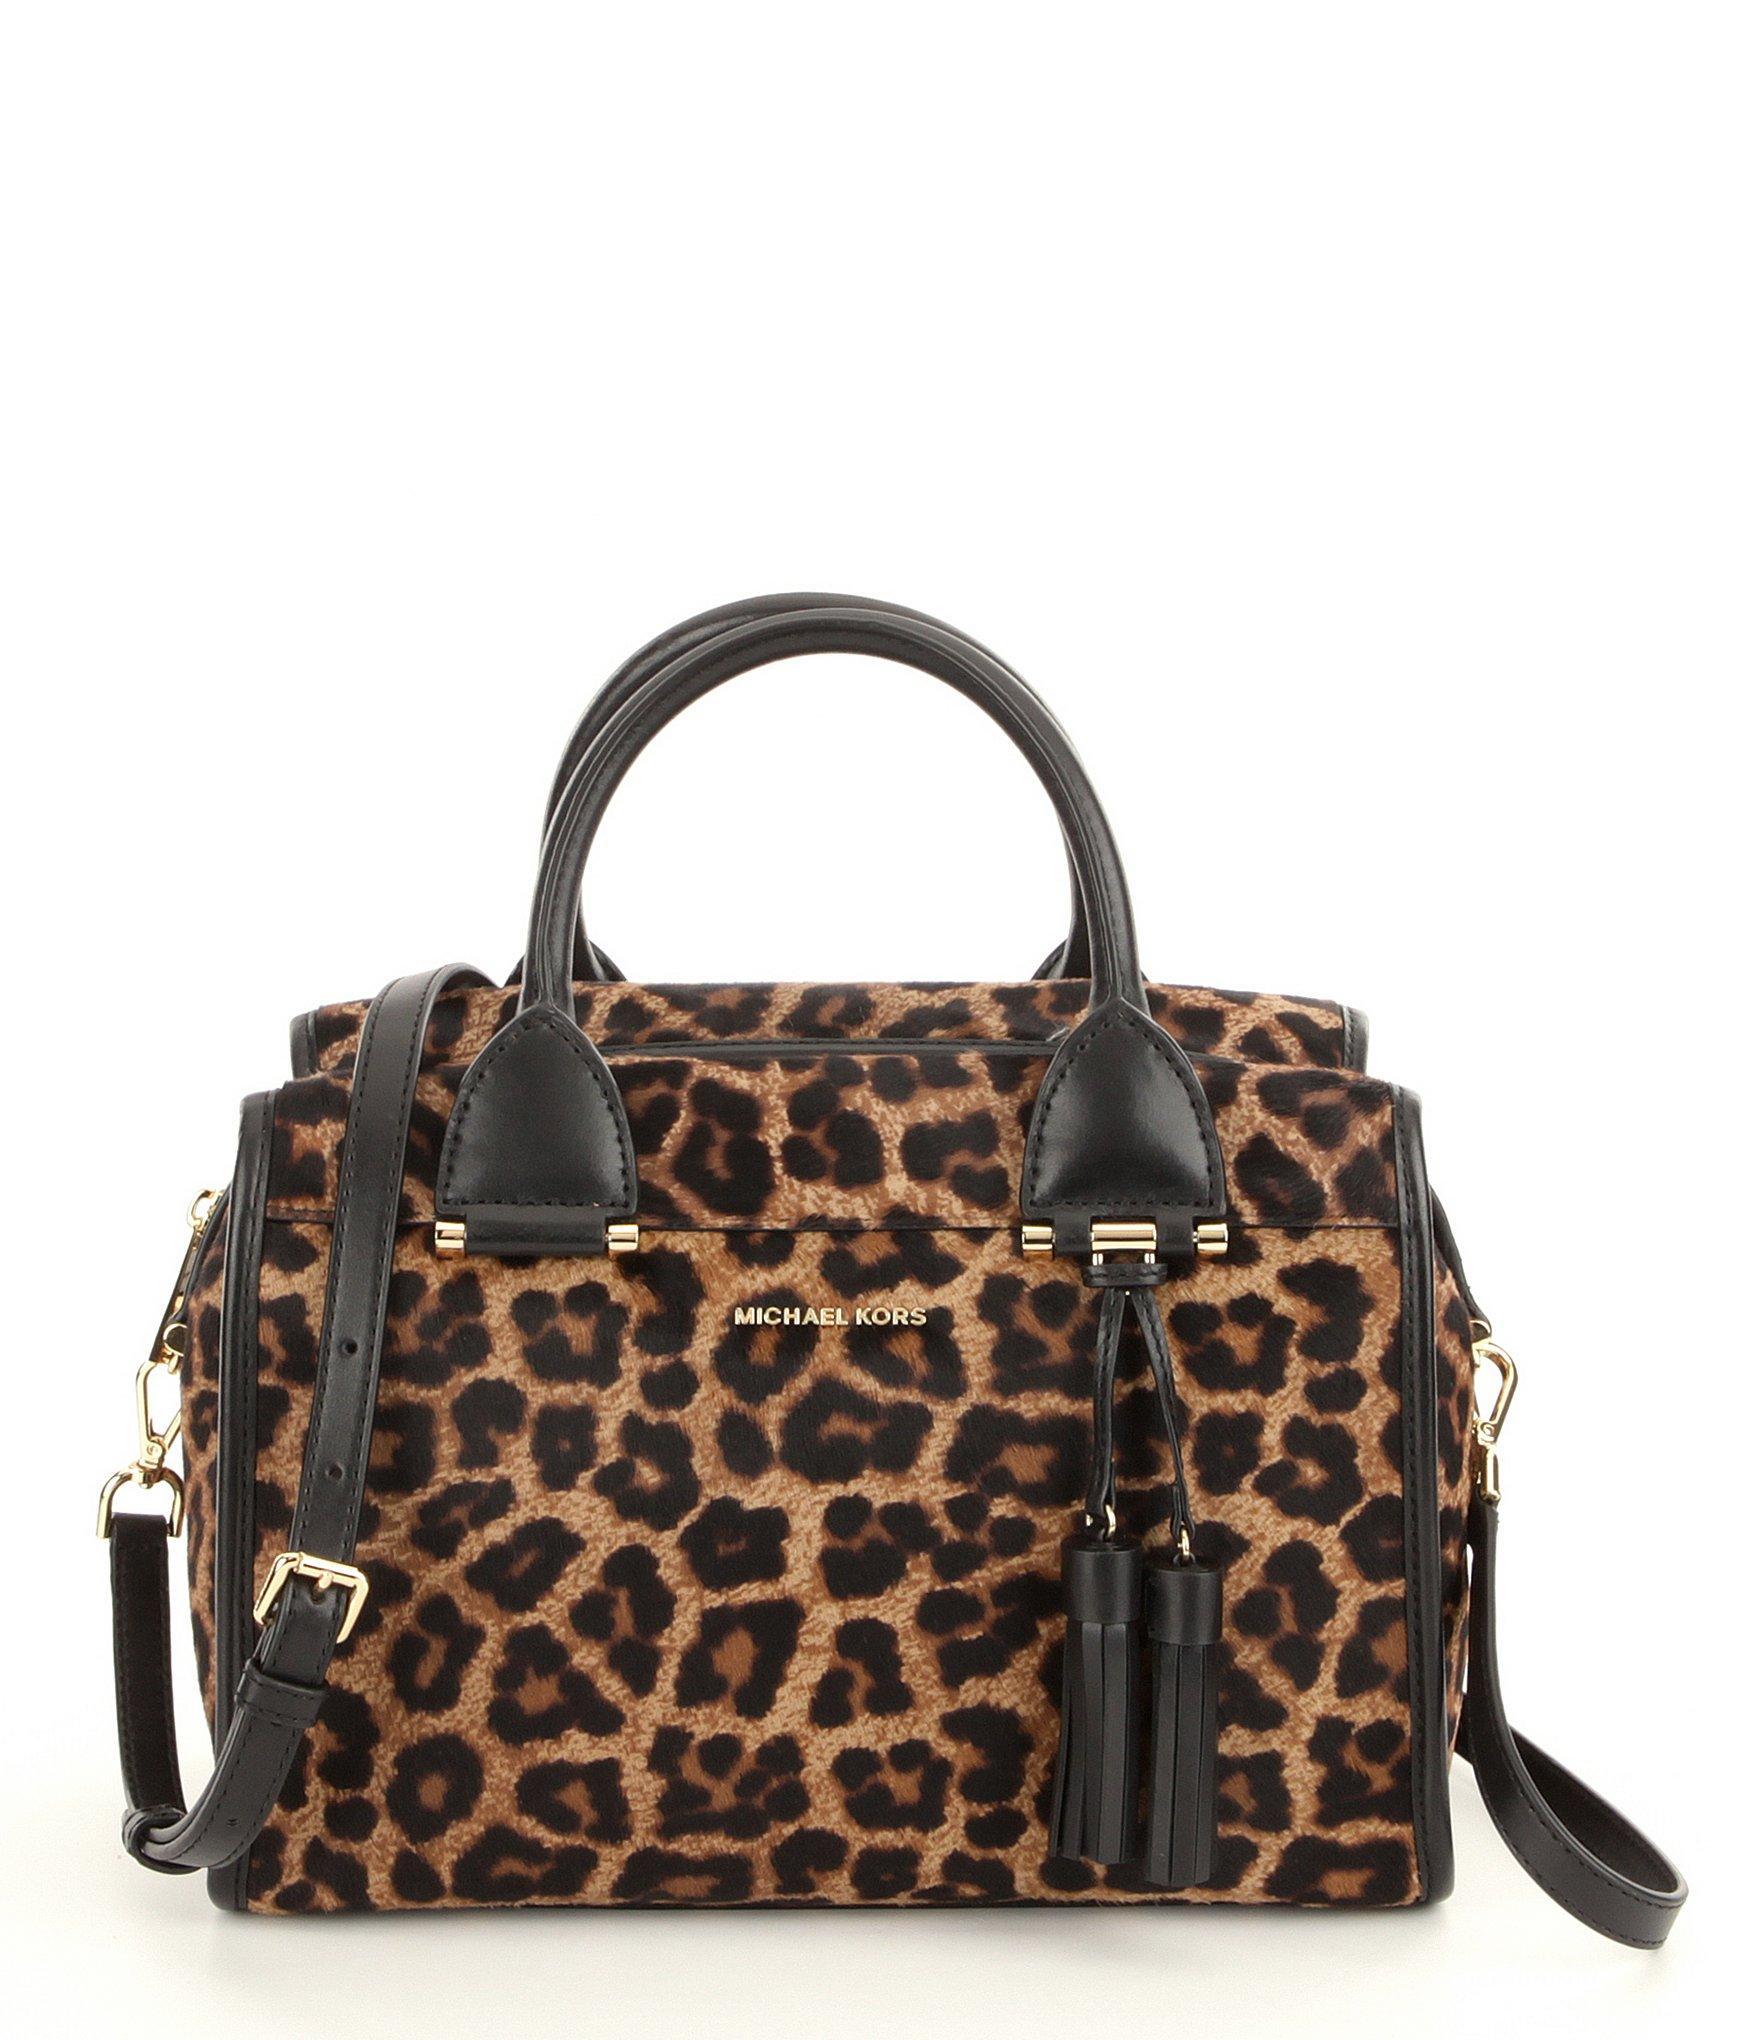 6c2bbbf2629c74 ... Black Cheetah Michael Kors Bag: Michael Michael Kors Geneva Tasseled  Leopard-print